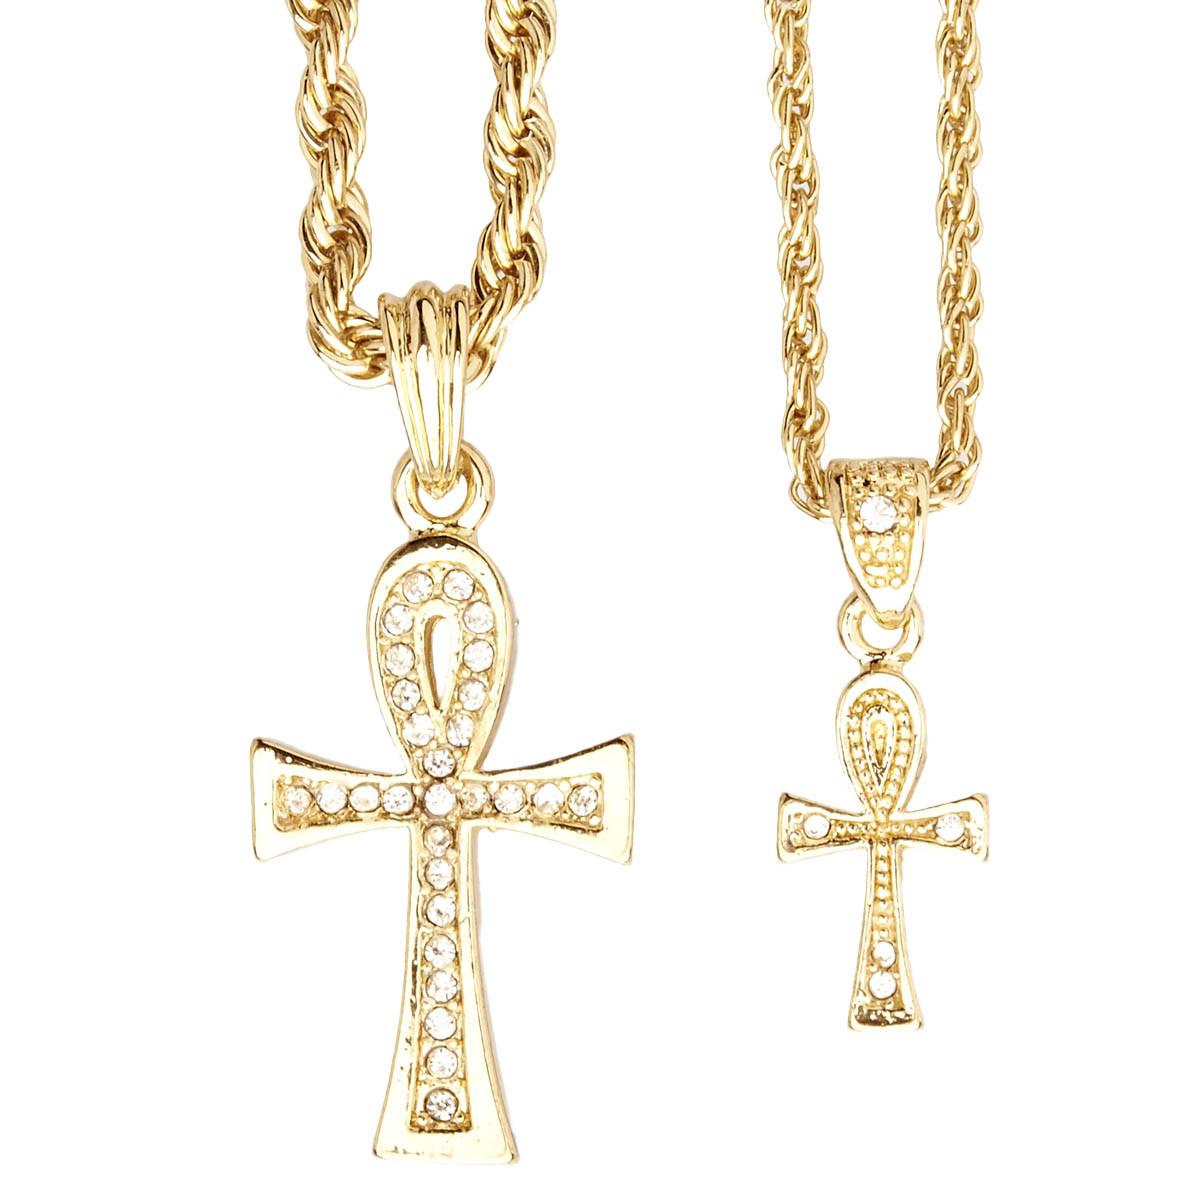 Iced Out Bling Mini Pendant Chain Set - 2 x Cross gold - Uni / zlatá